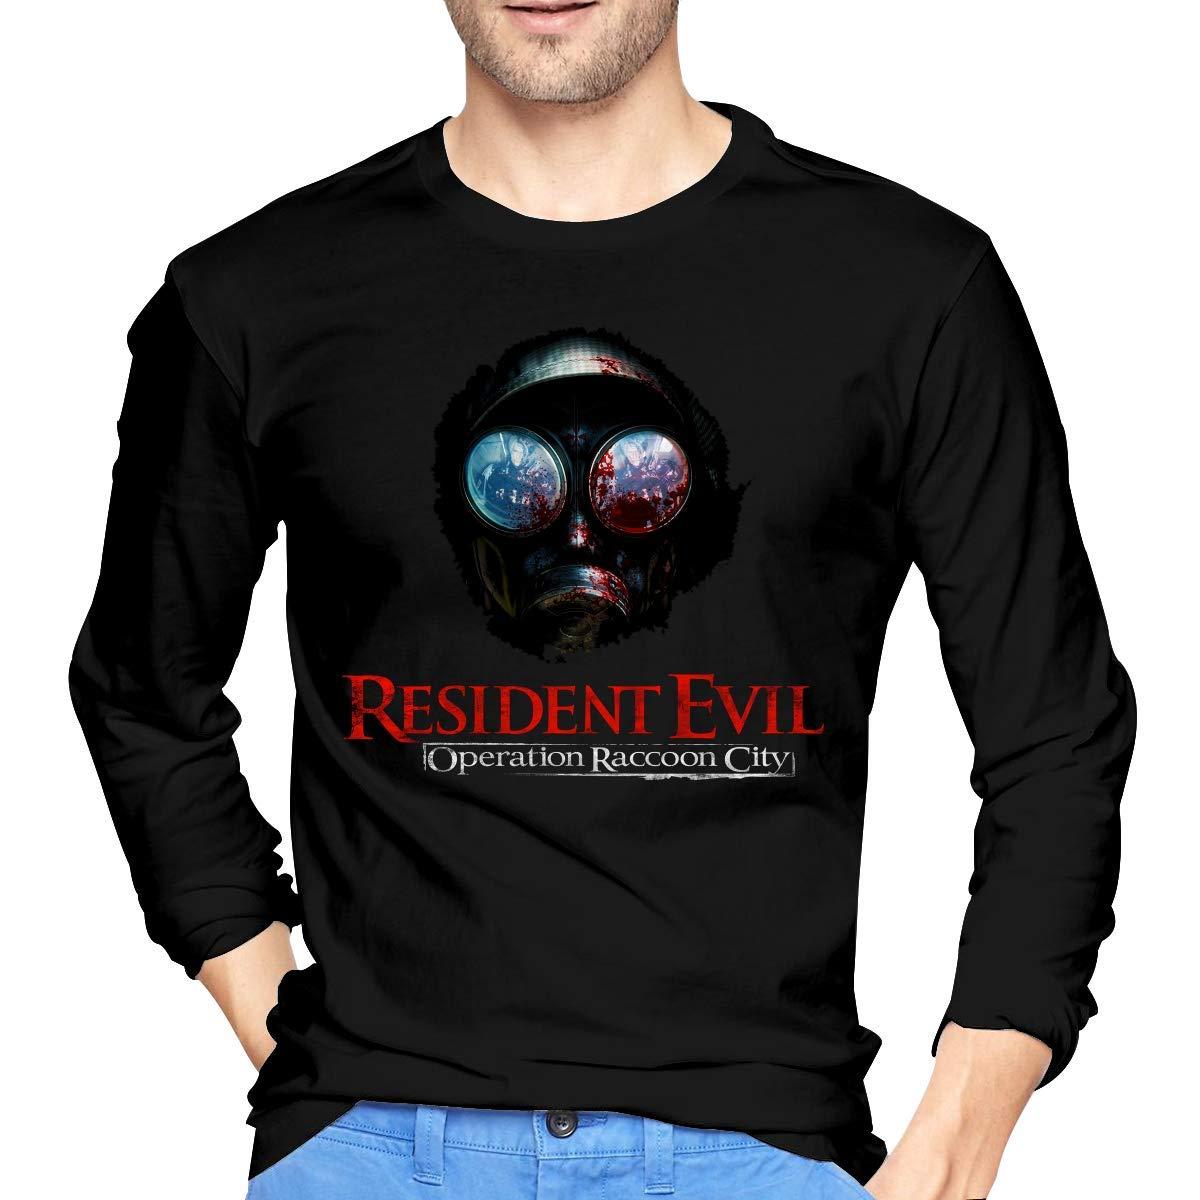 Fssatung S Resident Evil Operation Raccoon City Tees Black Shirts